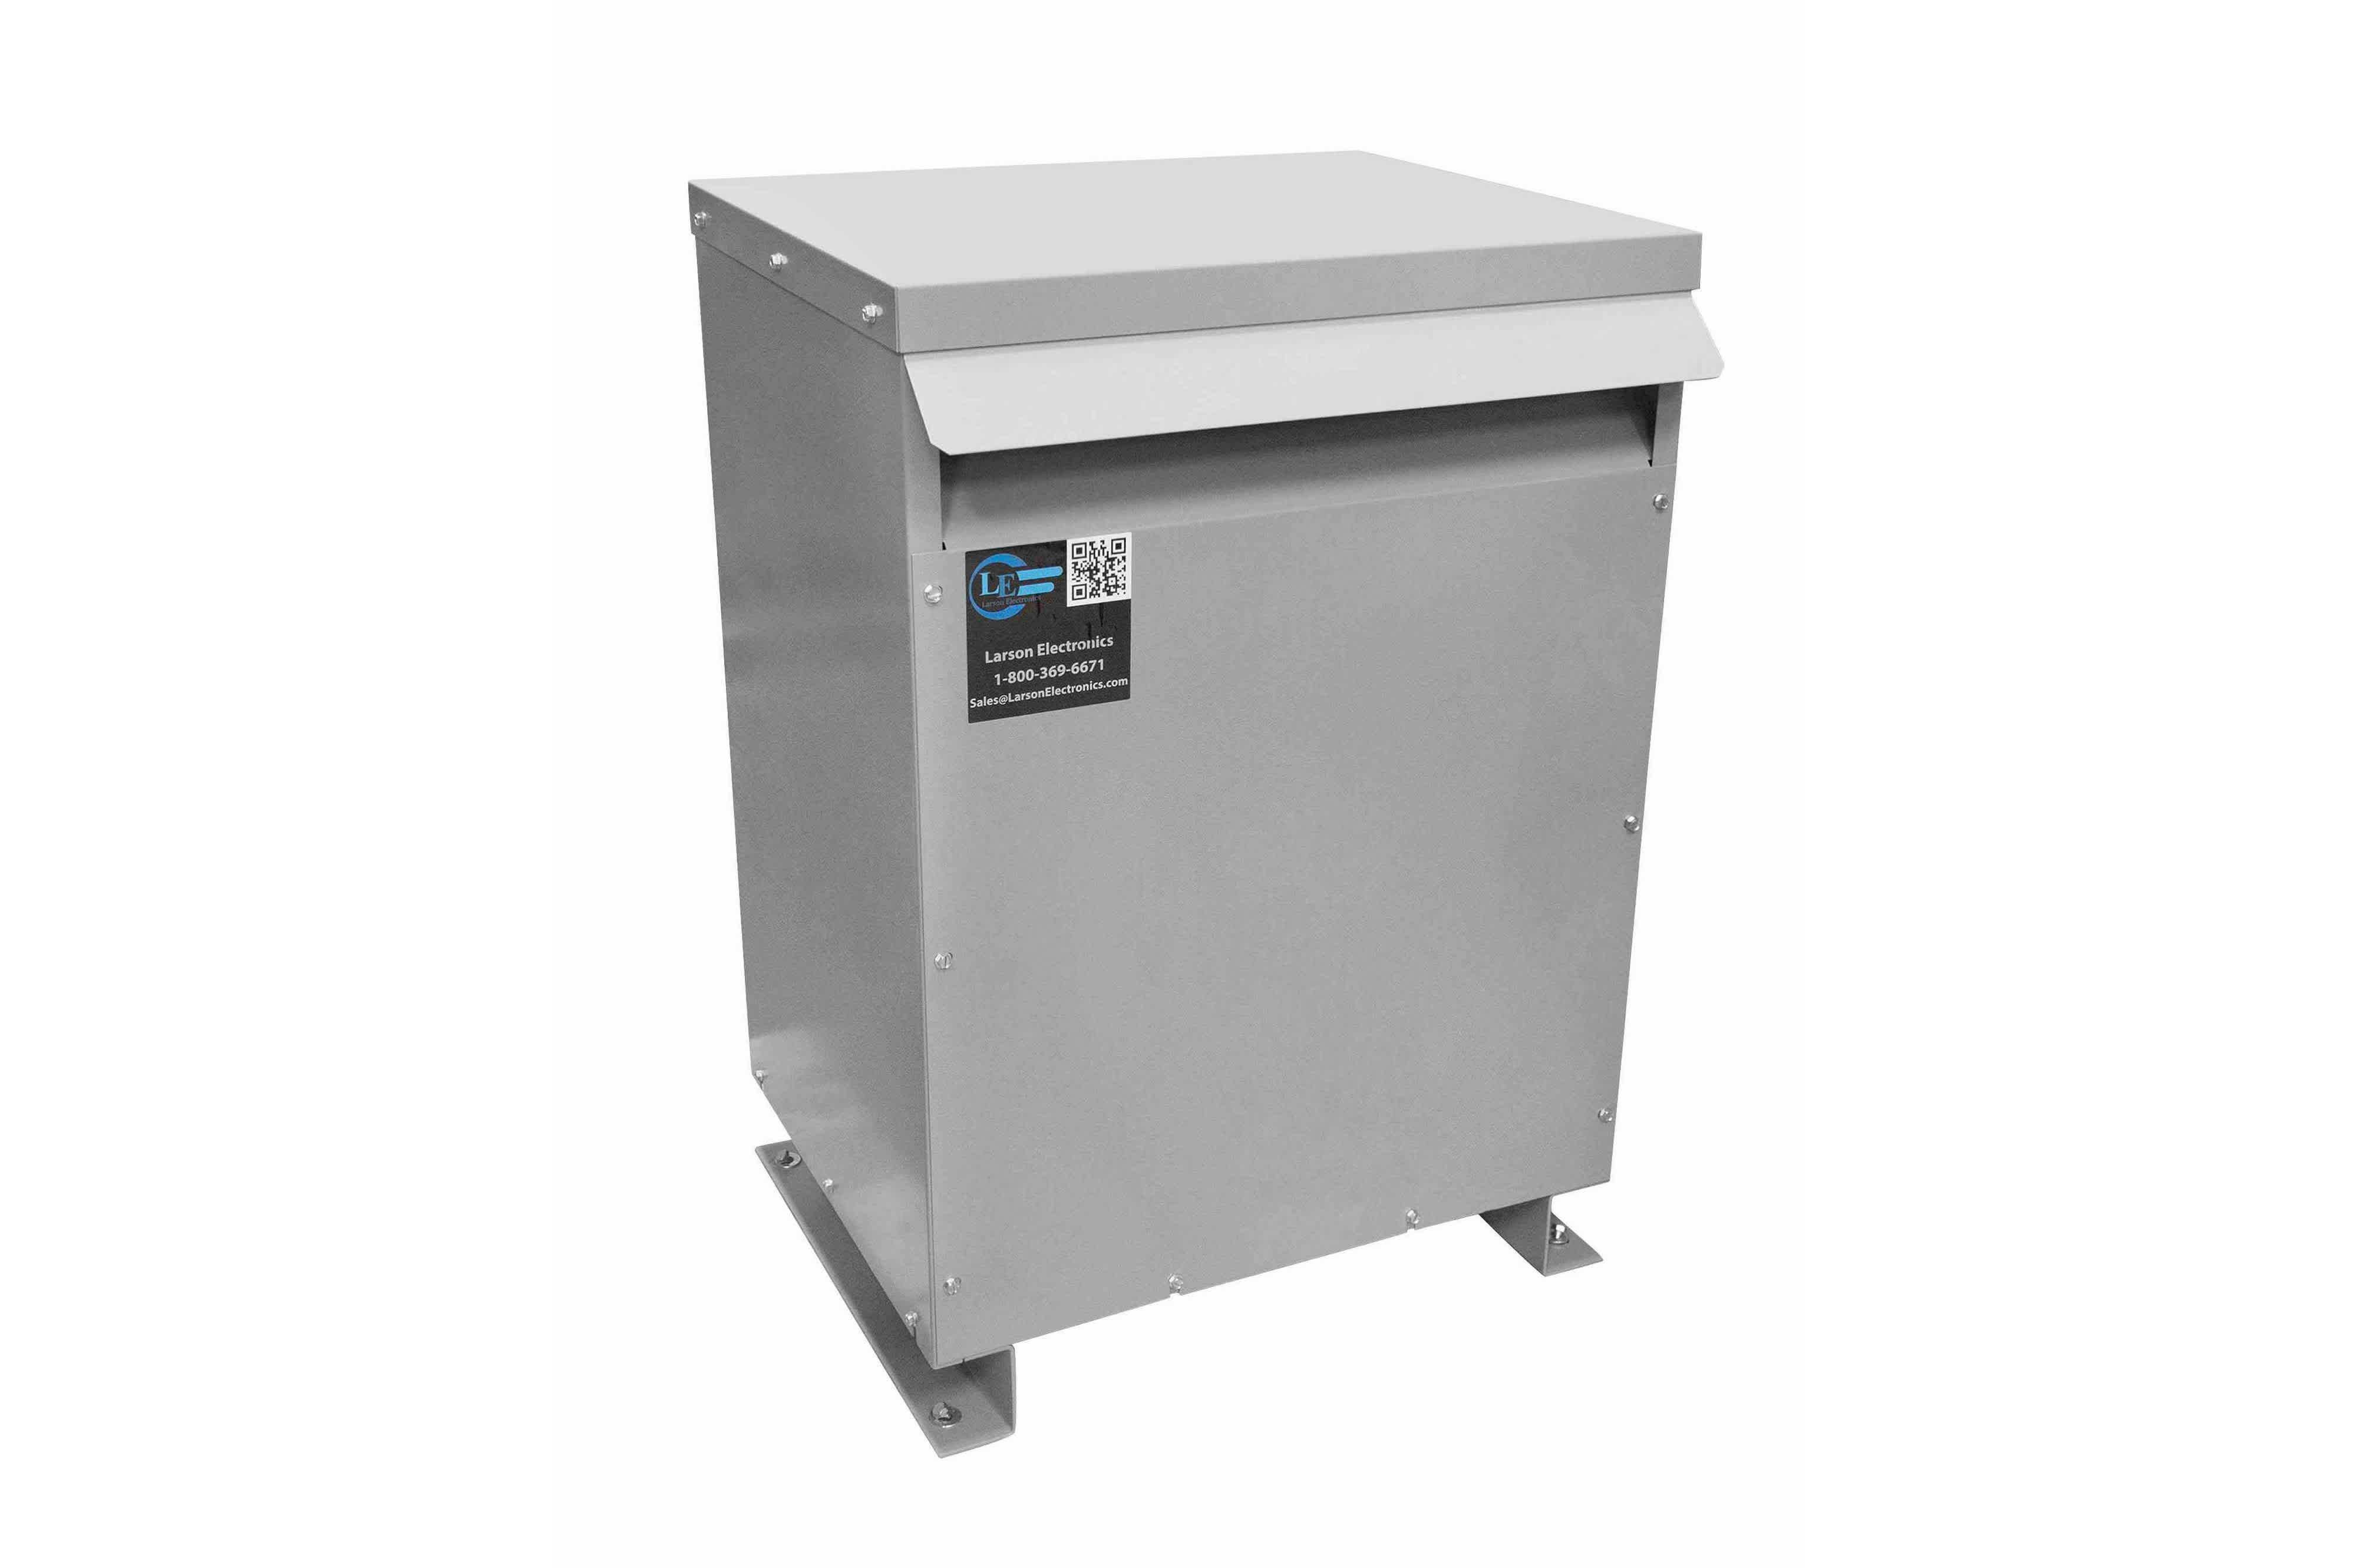 250 kVA 3PH Isolation Transformer, 480V Wye Primary, 240V Delta Secondary, N3R, Ventilated, 60 Hz